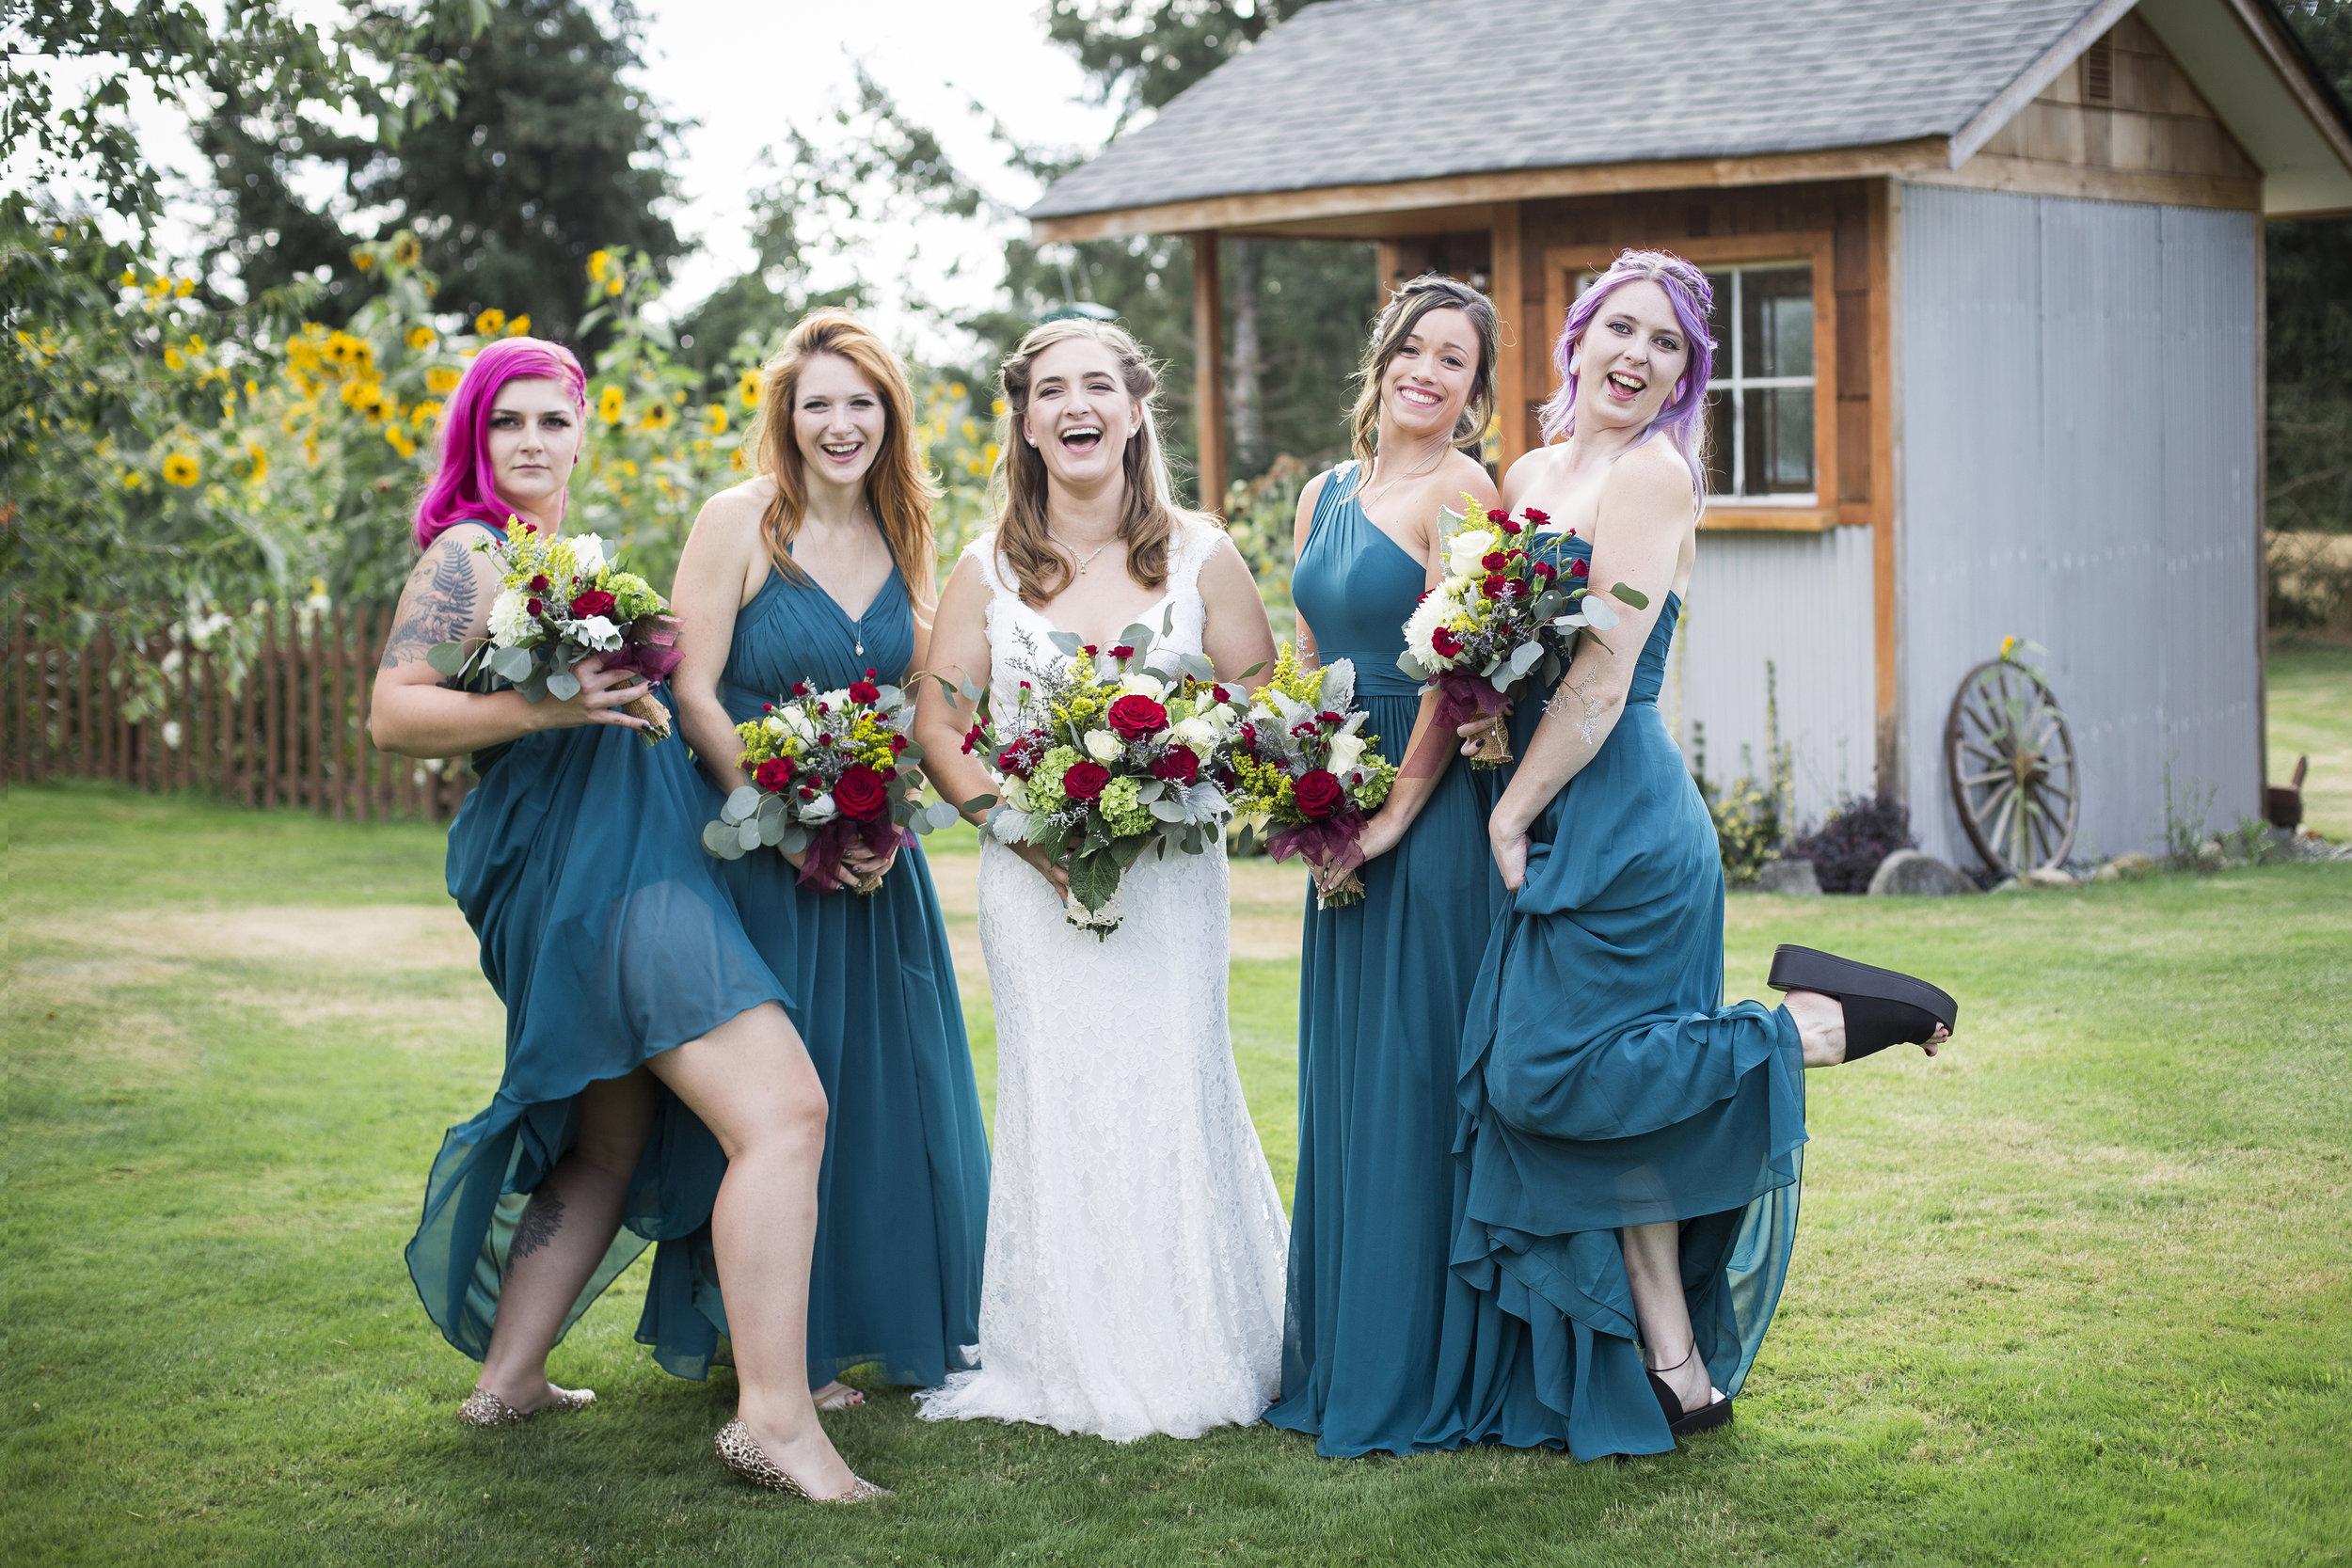 Seattle-Tacoma-Wedding-Photographer-Jaeda-Reed-Fall-Glenwood-Tree-Farm-08.jpg